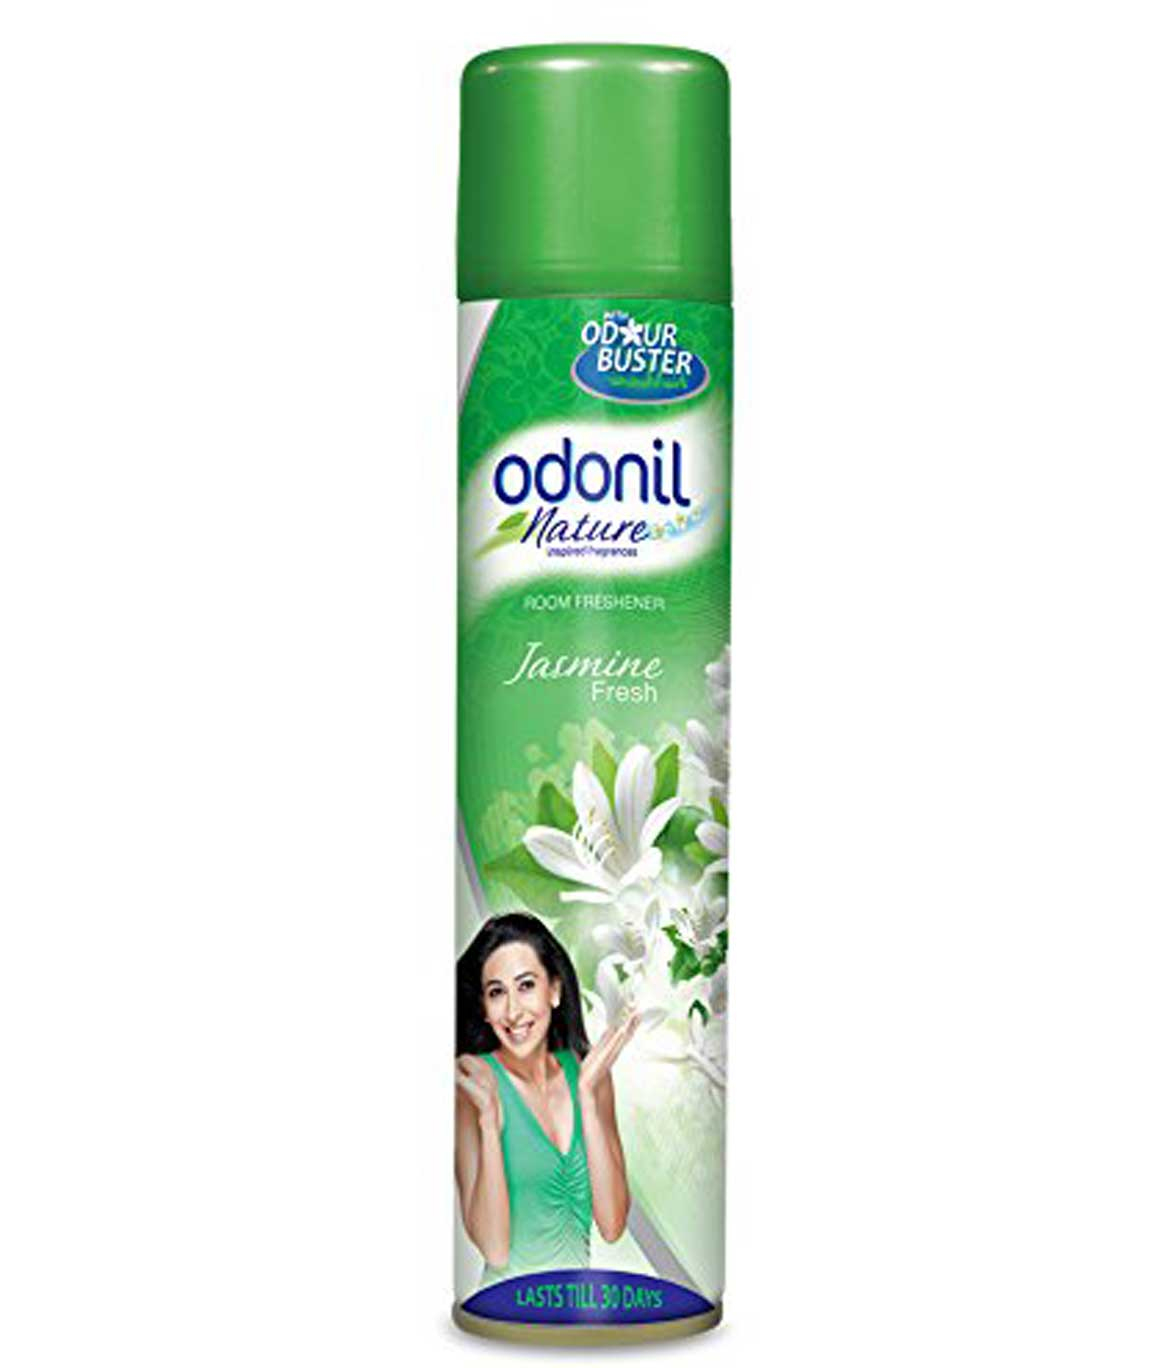 Odonil Room Spray Home Freshener Jasmine - 550 g